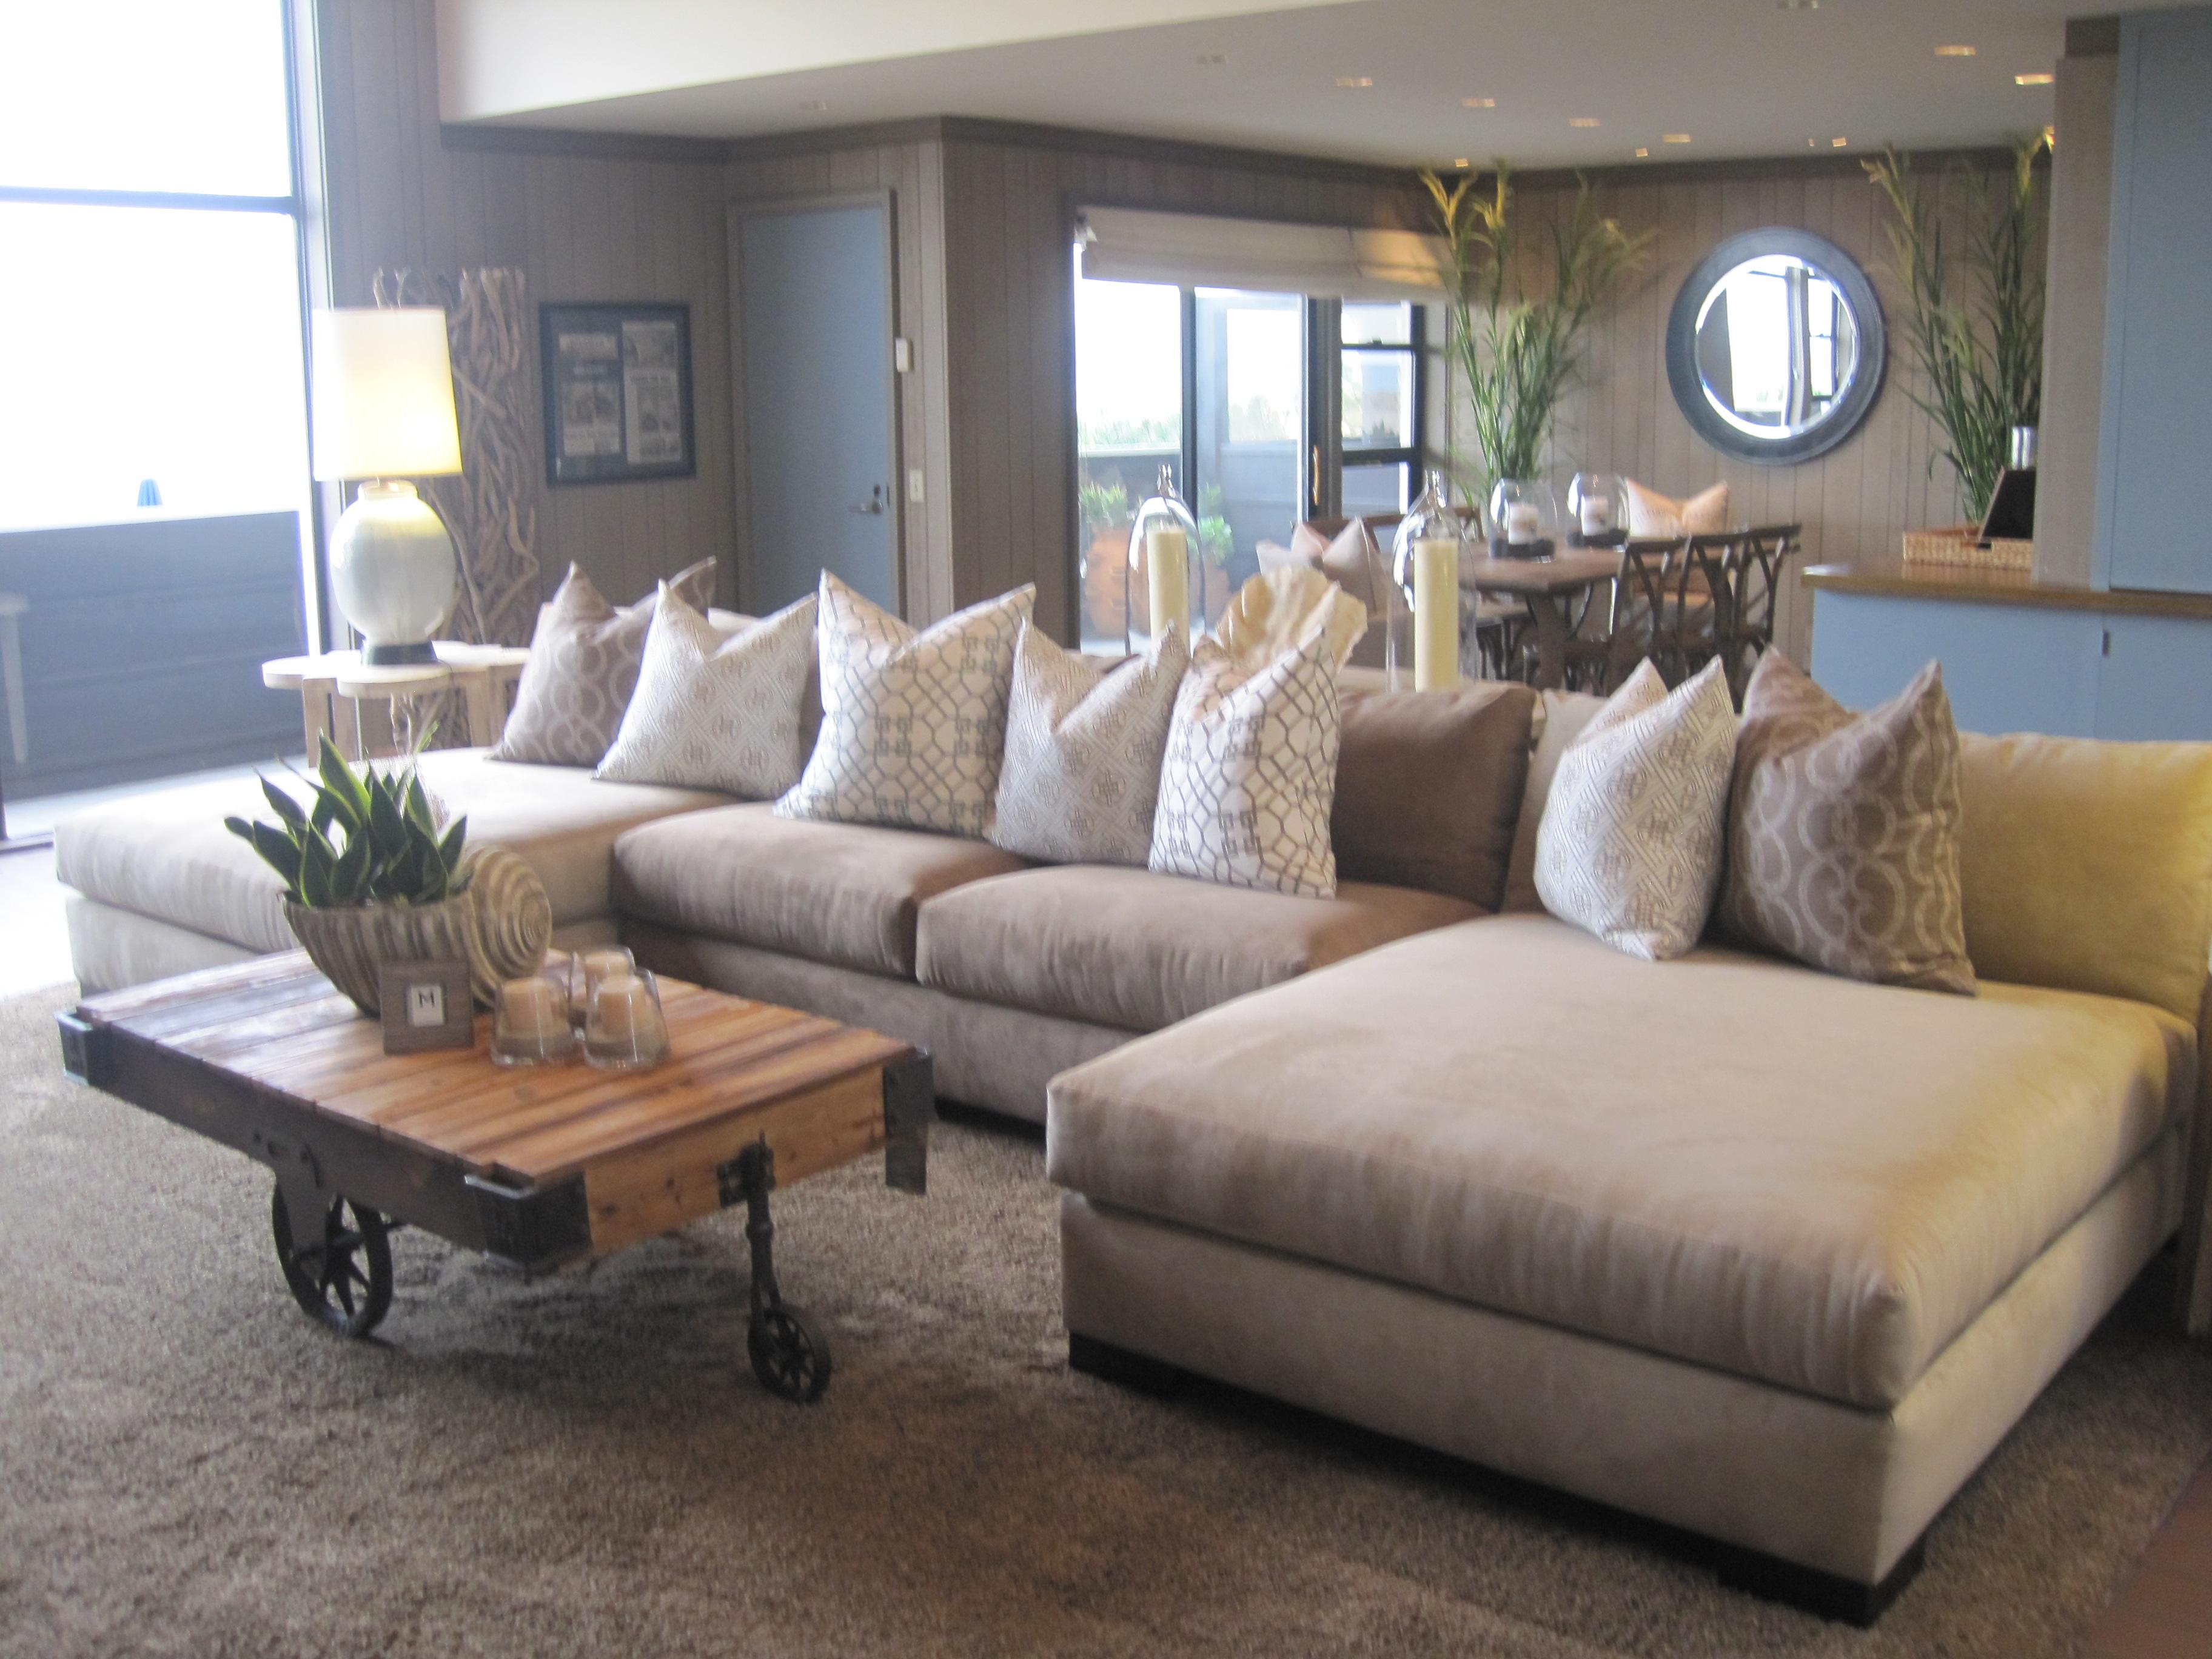 furniture-sectionals-berkline-sectional-